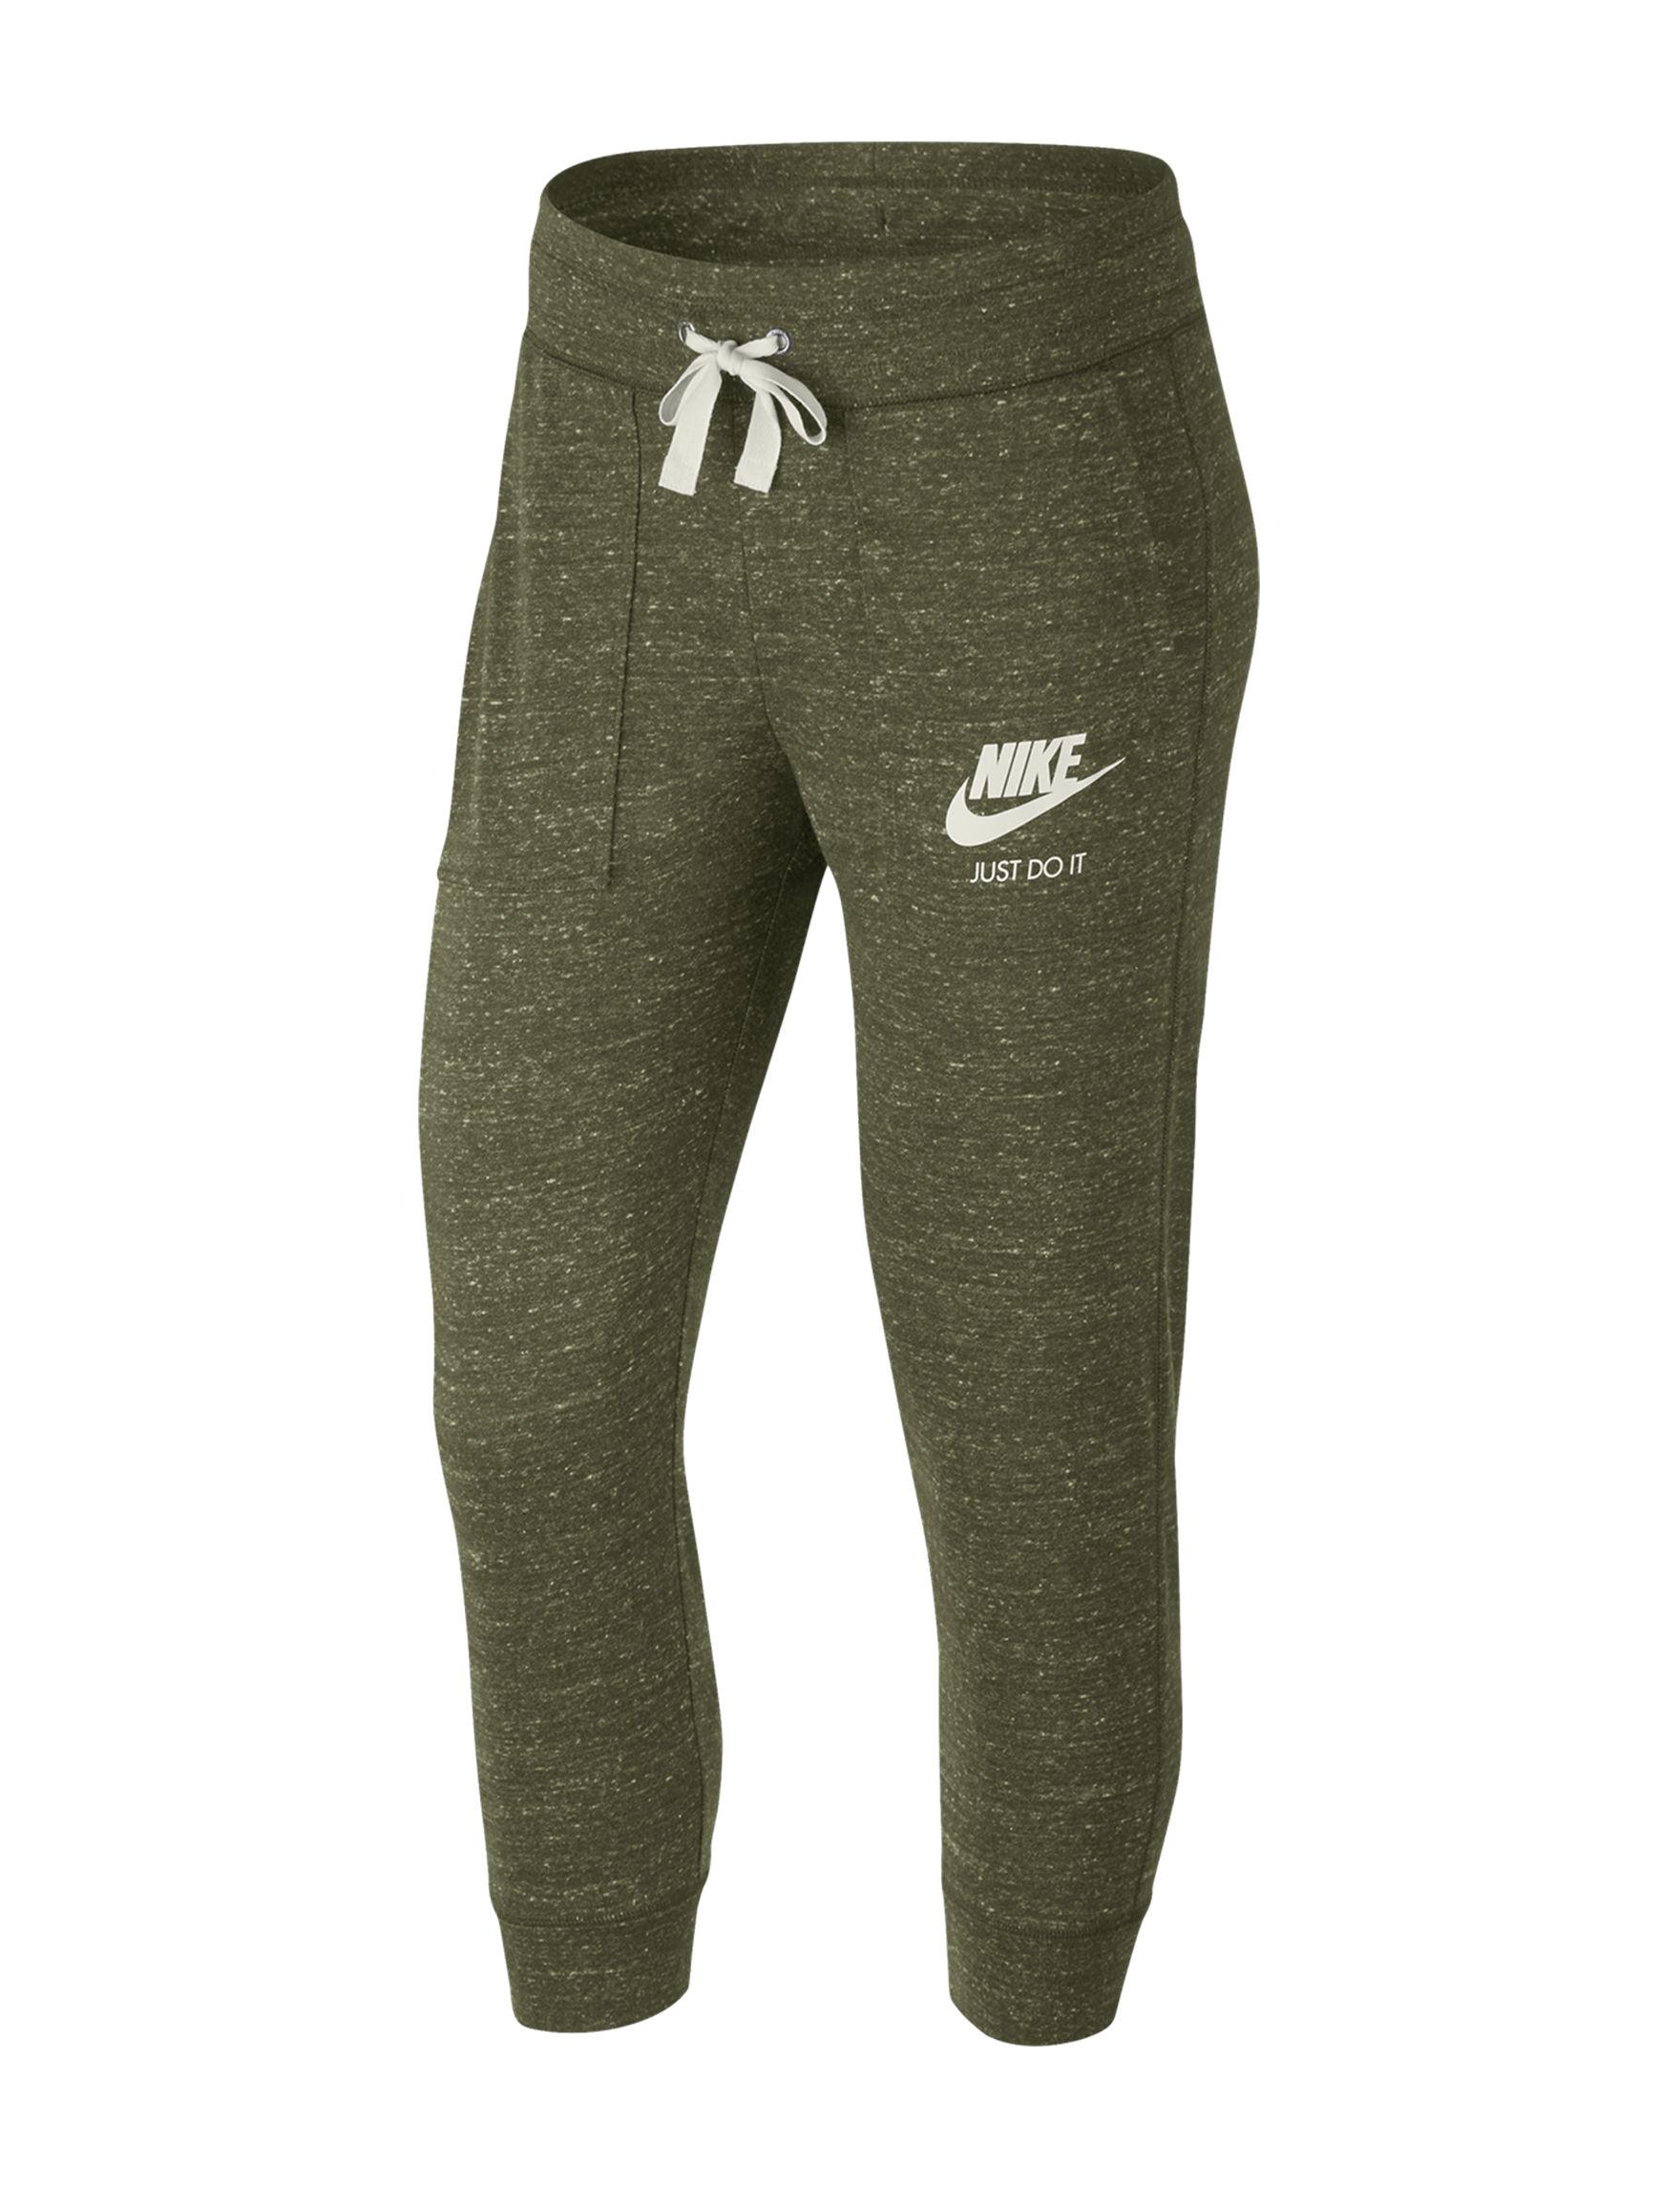 Nike Green Leggings